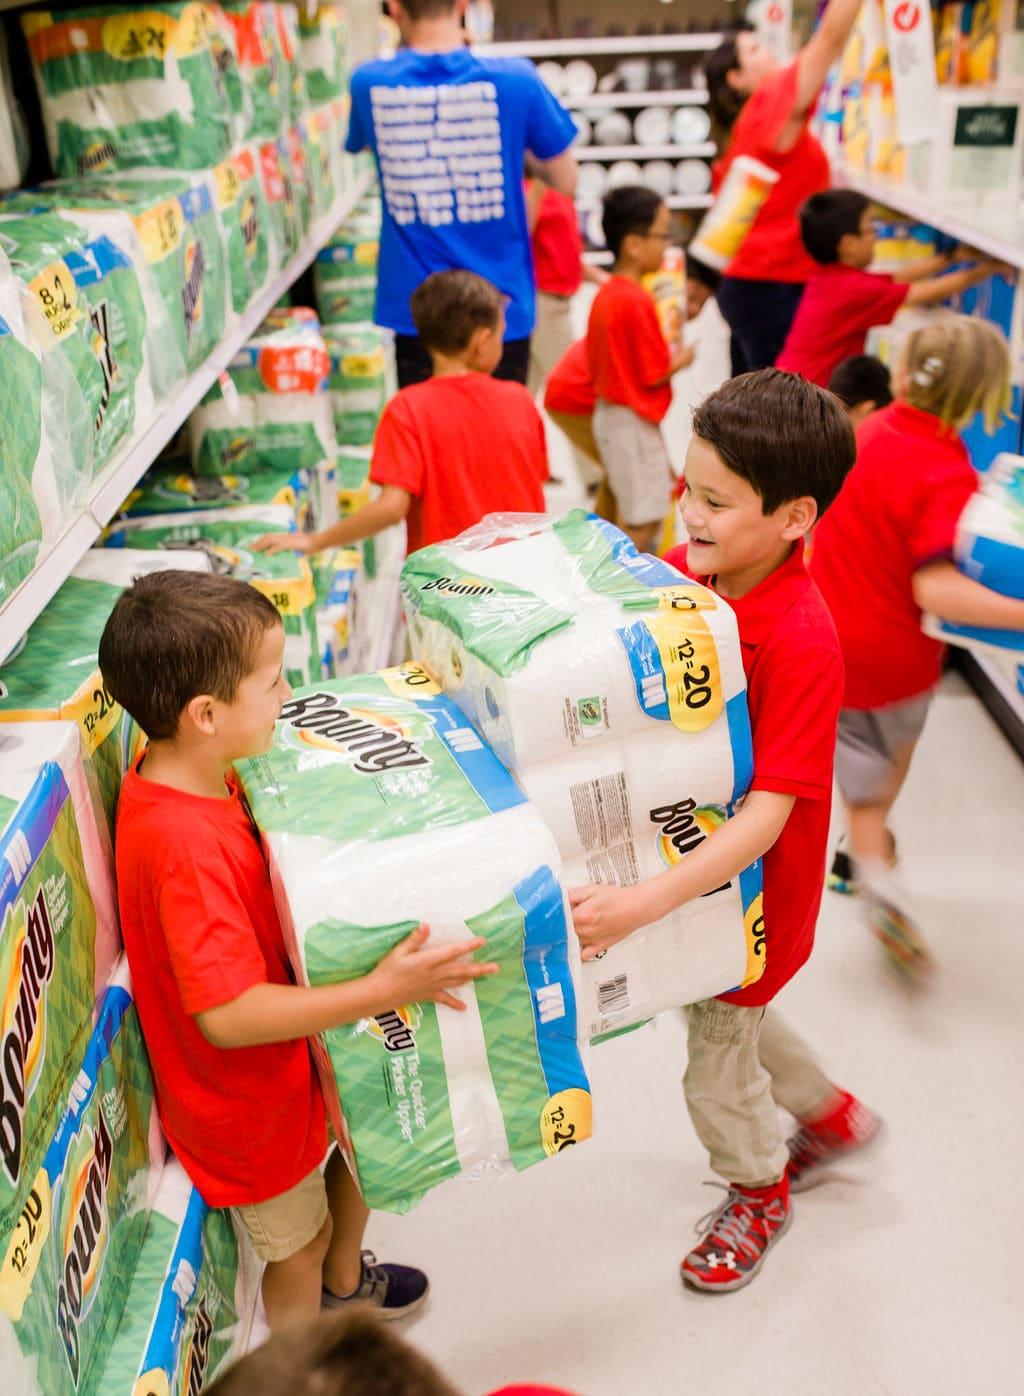 kids holding paper towel